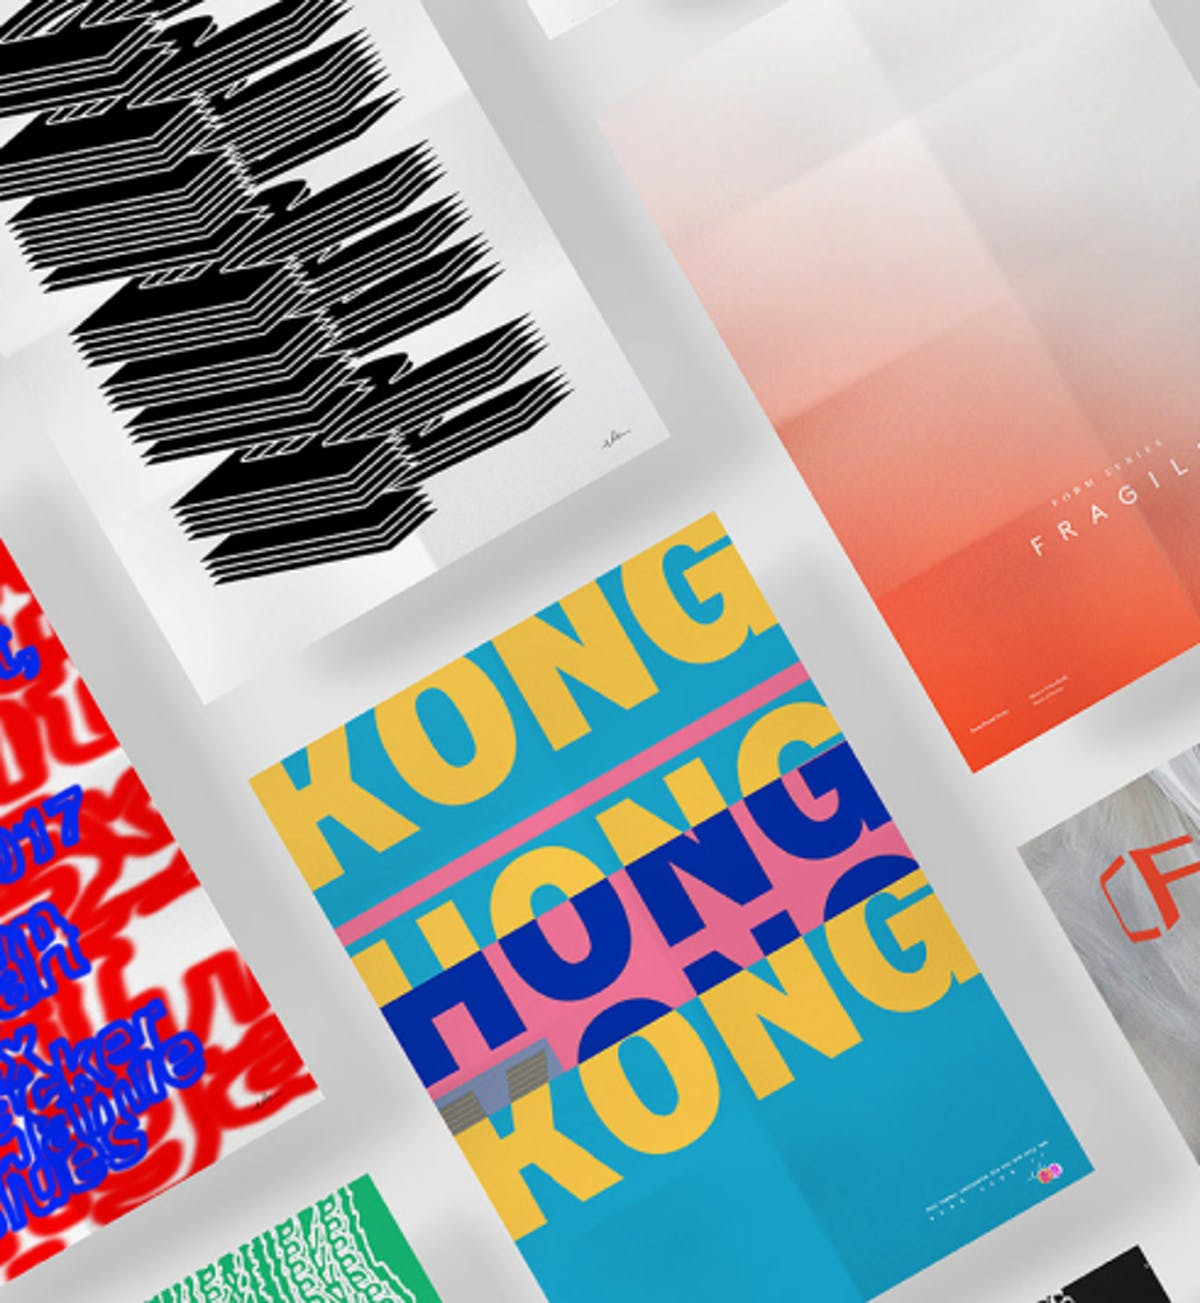 Random Poster Art Collections thumbnail